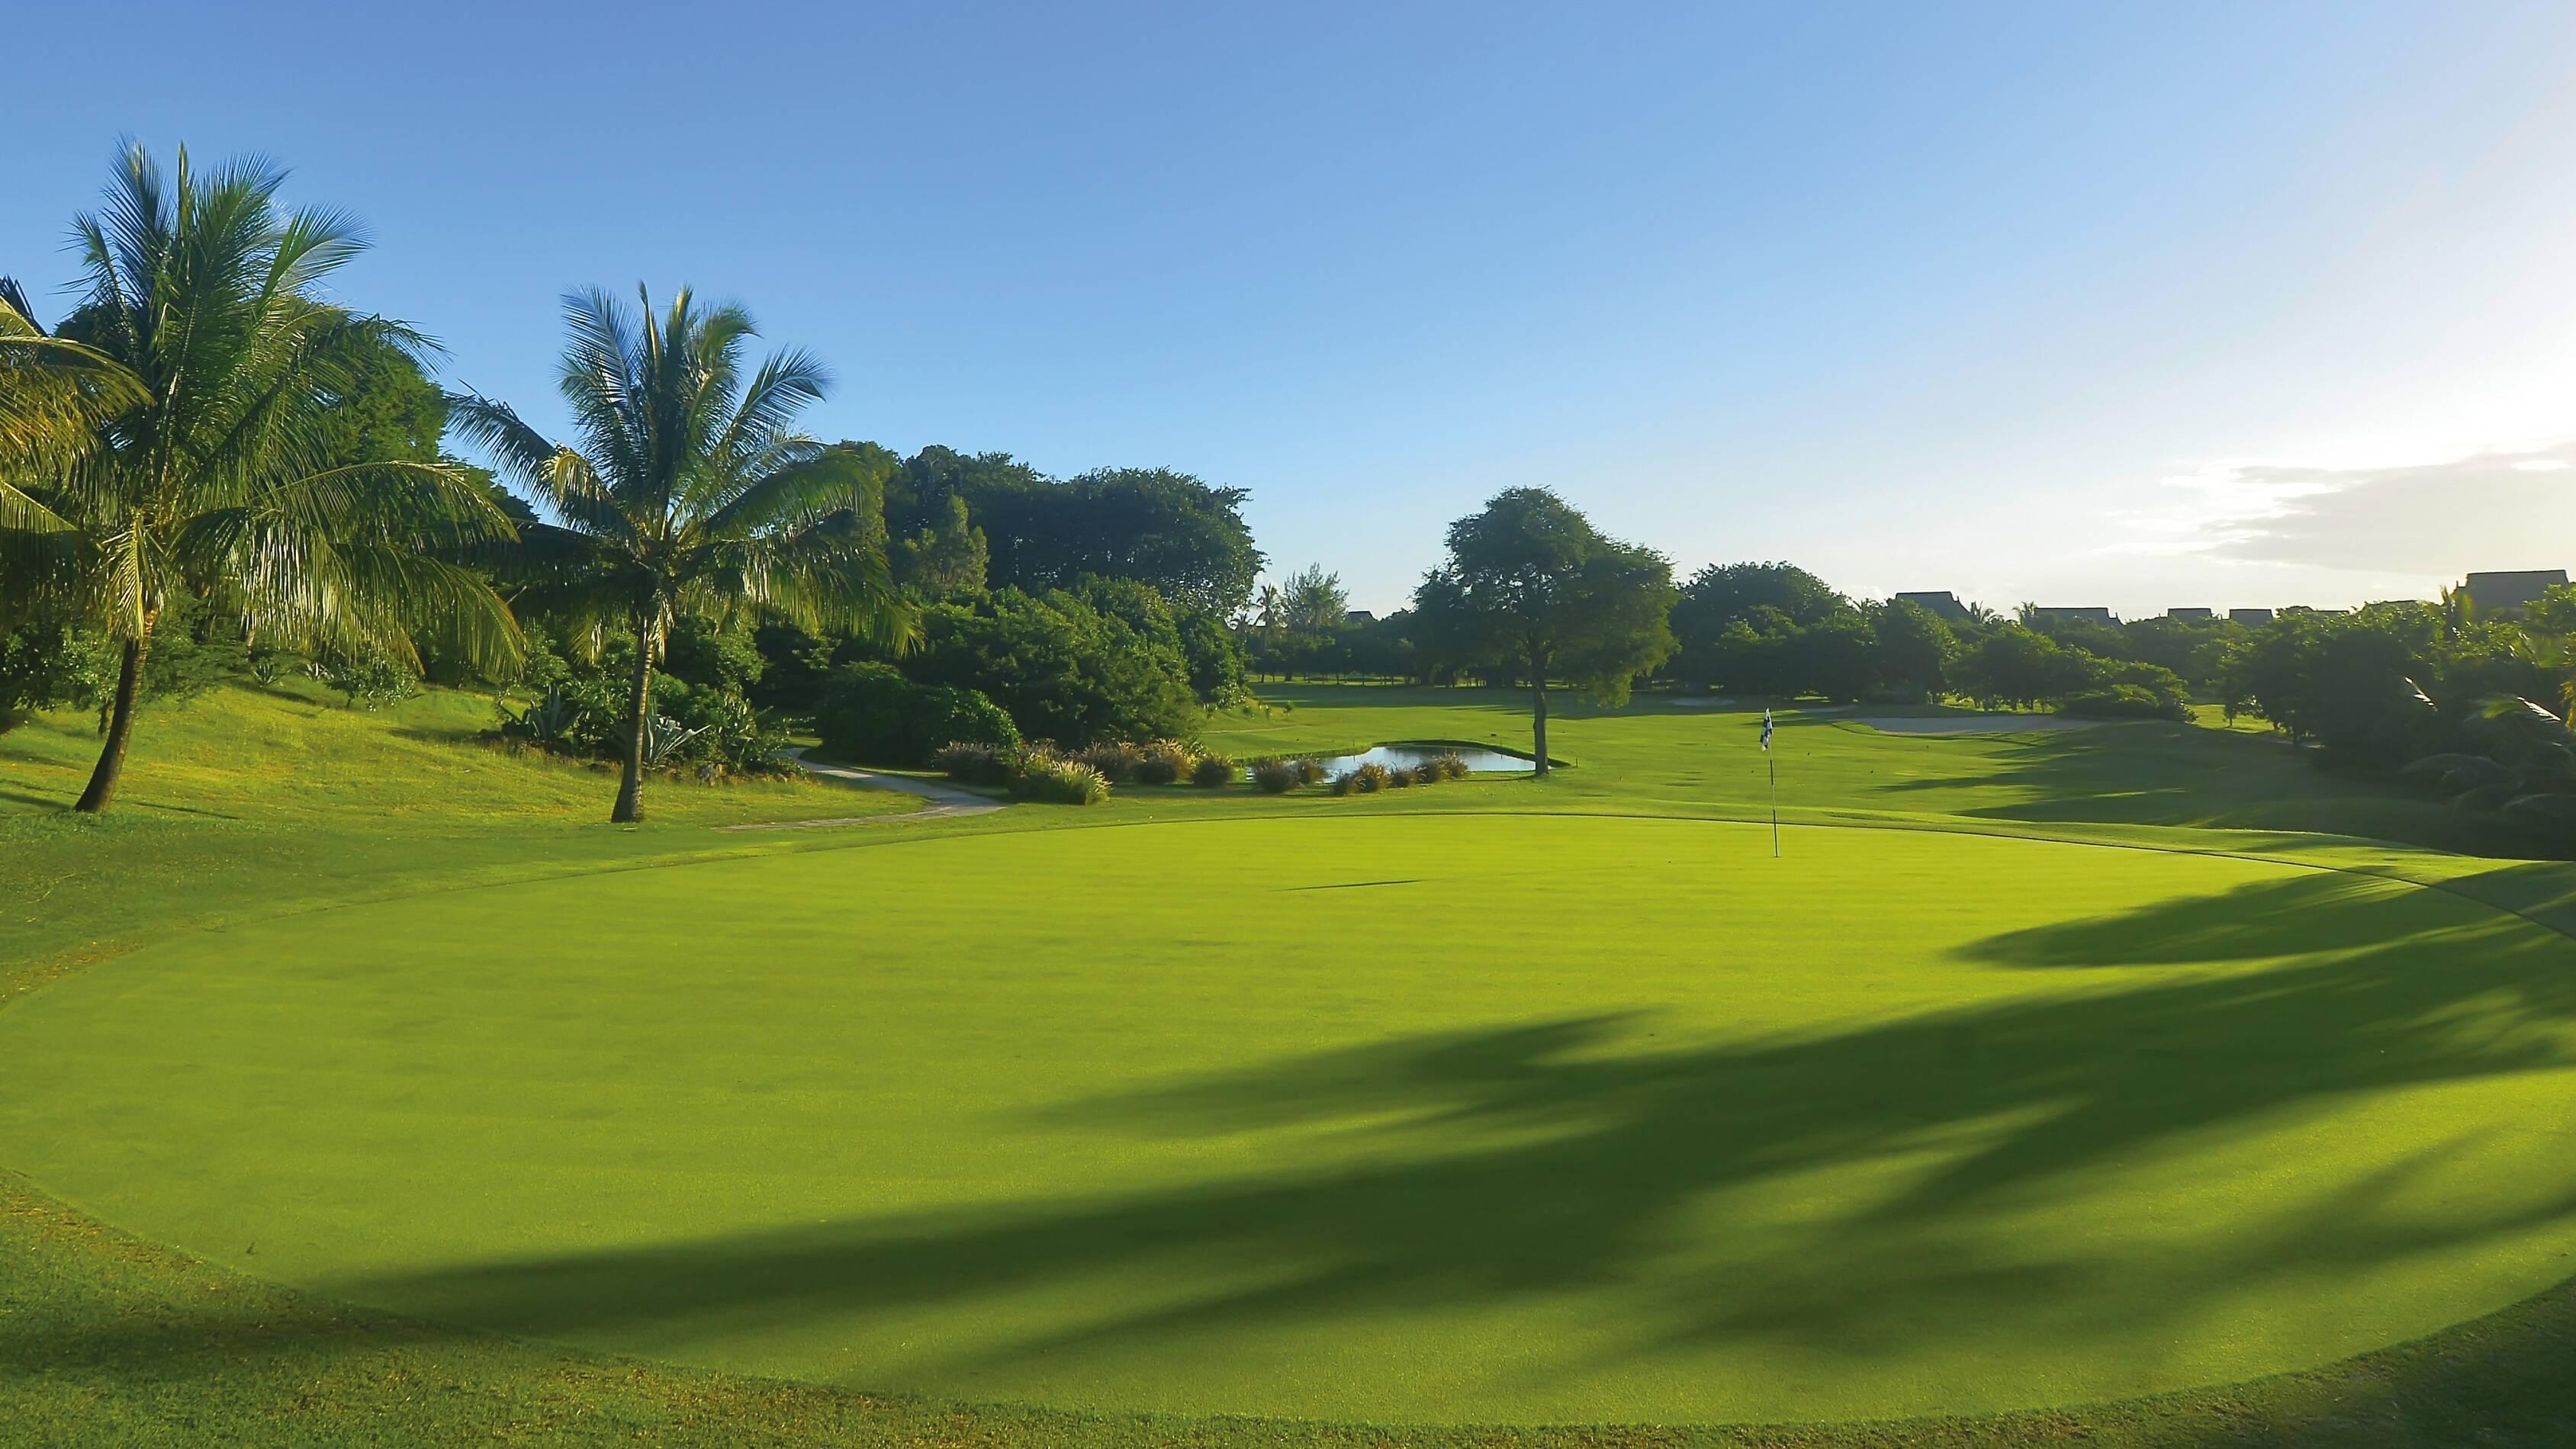 Dinarobin Beachcomber Golf Maurice New Mauritius Hotels